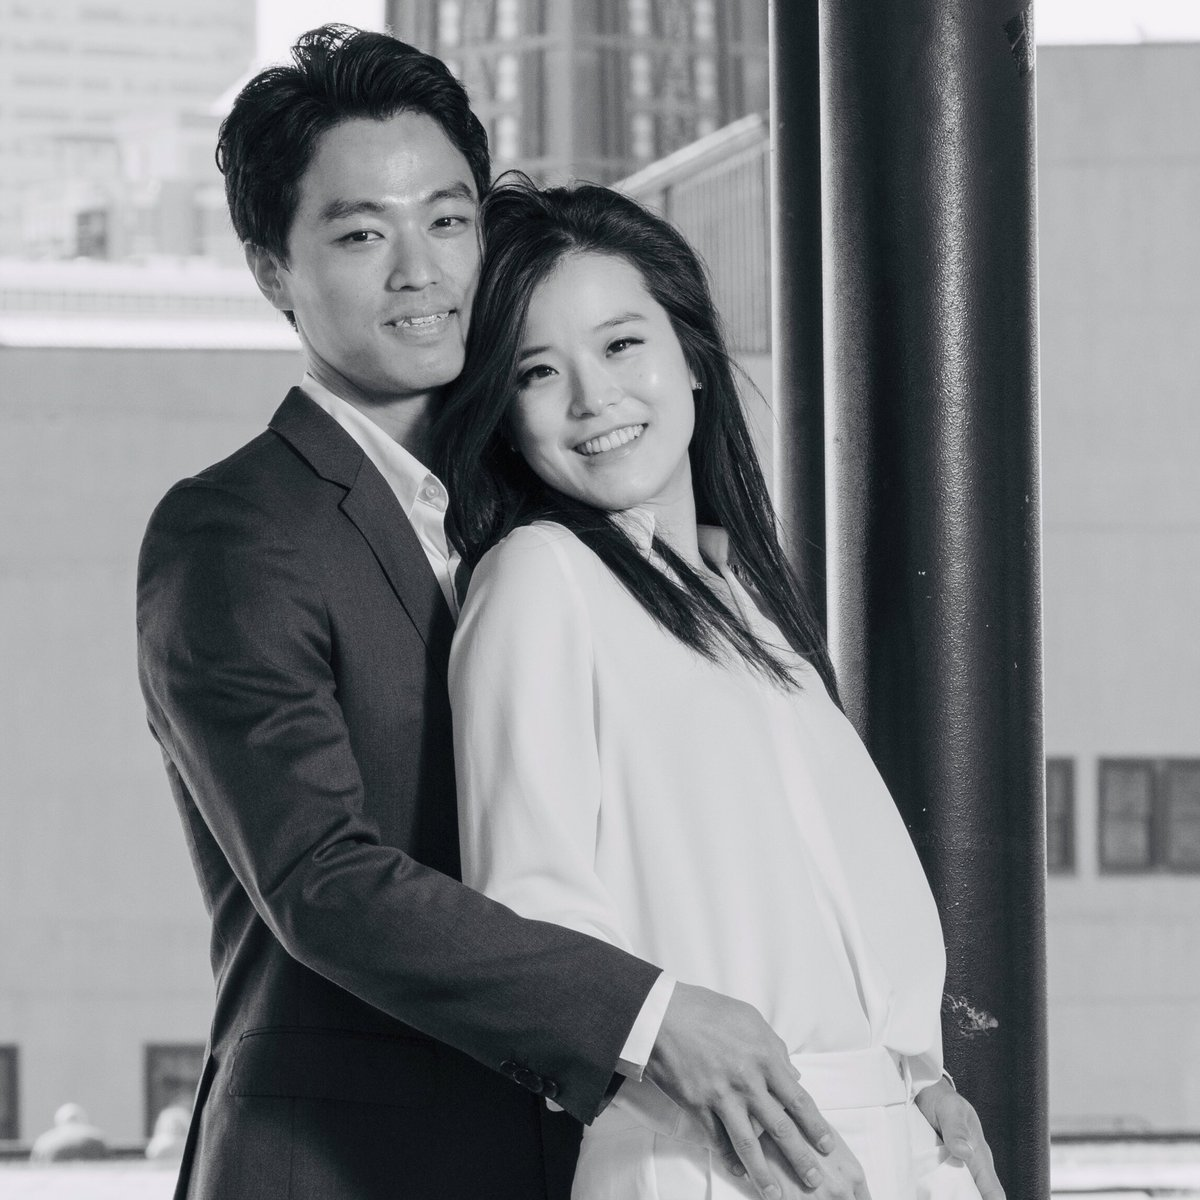 Happy couple!!!   #newyork #newyorkcity #photography #photographer #portrait #saveyourdate #picyourdate #eventphotography #anniversary #뉴욕 #뉴욕여행스냅 #뉴욕웨딩스냅 #뉴욕여행 #뉴욕여행사진 #여행에미치다_뉴욕 #뉴욕커플스냅 #뉴욕스냅 #뉴욕웨딩 #웨딩스냅 #뉴욕노을 pic.twitter.com/o7bVG4YnZU